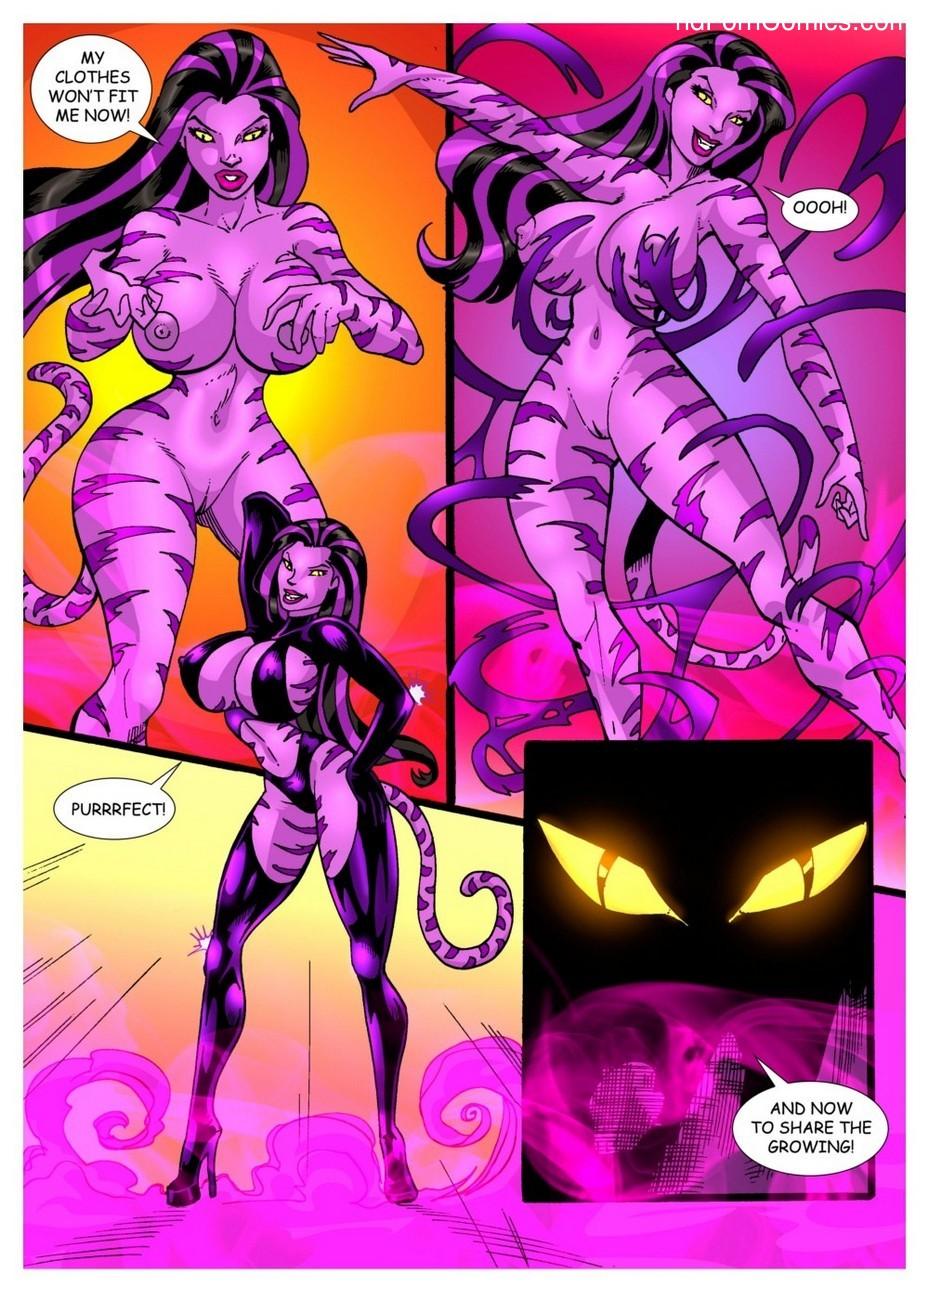 Alicia Goes Wonderland 1 7 free sex comic